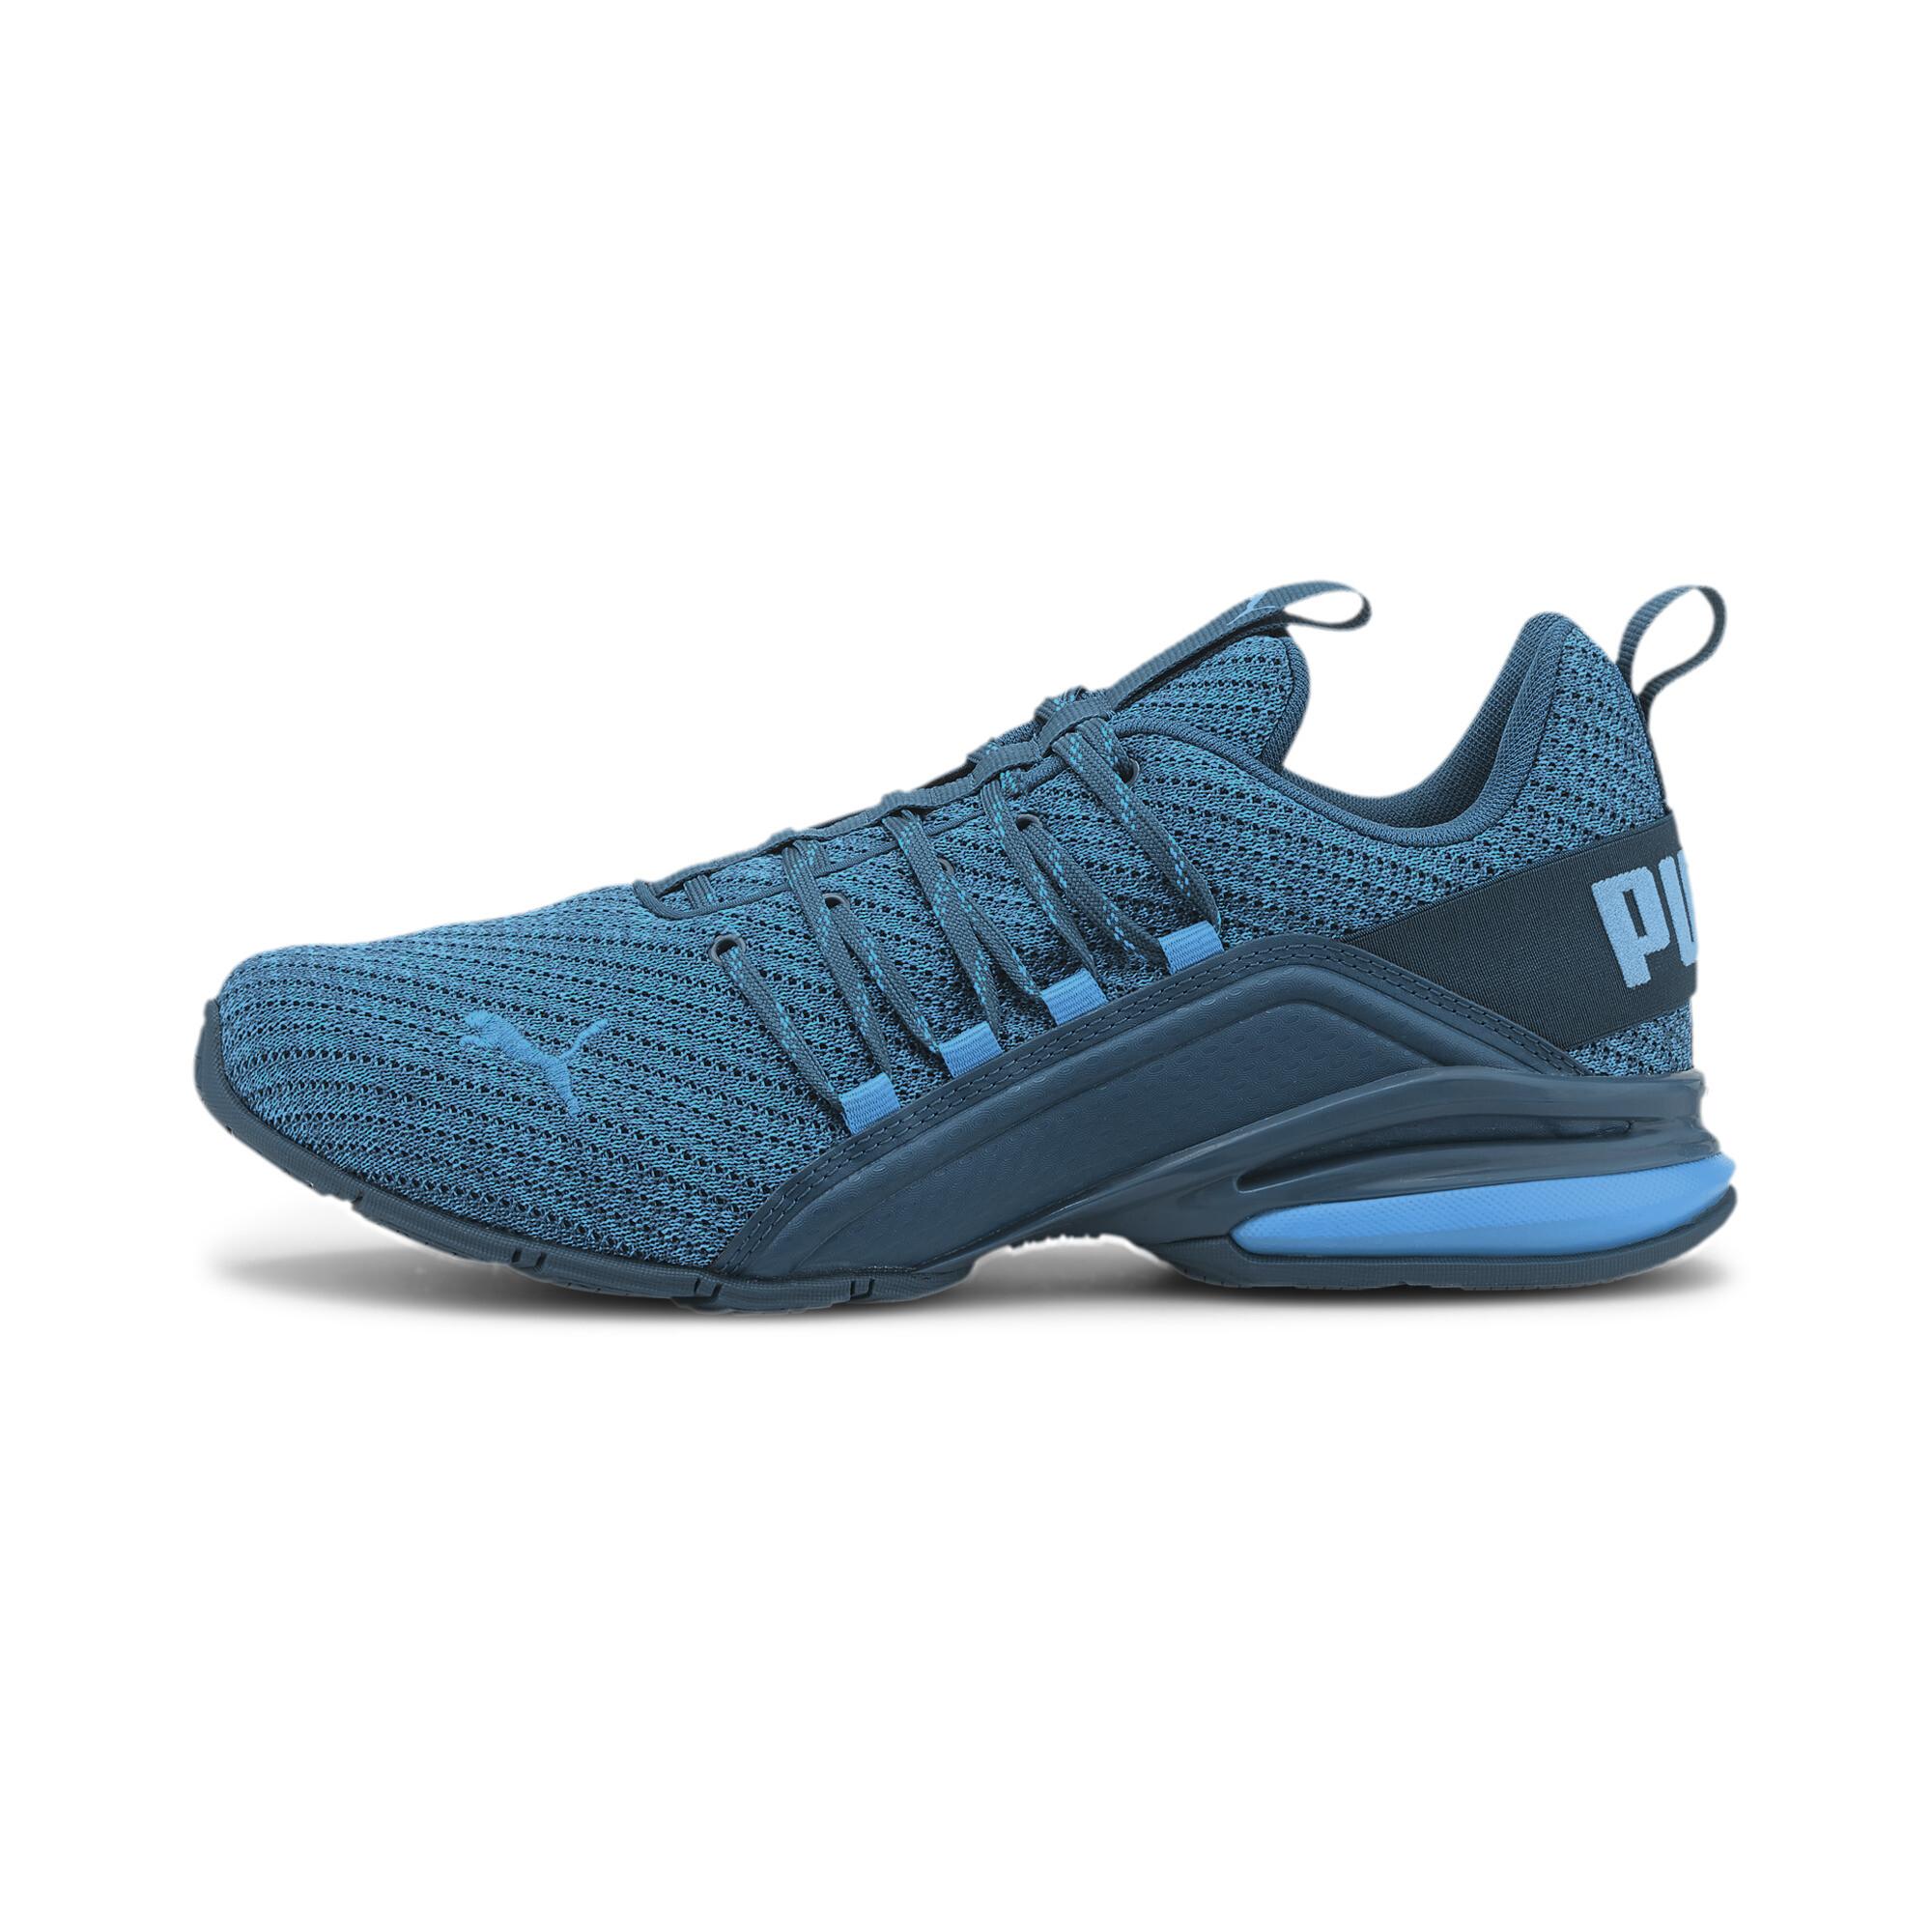 PUMA-Men-039-s-Axelion-Ultra-Running-Shoes thumbnail 18